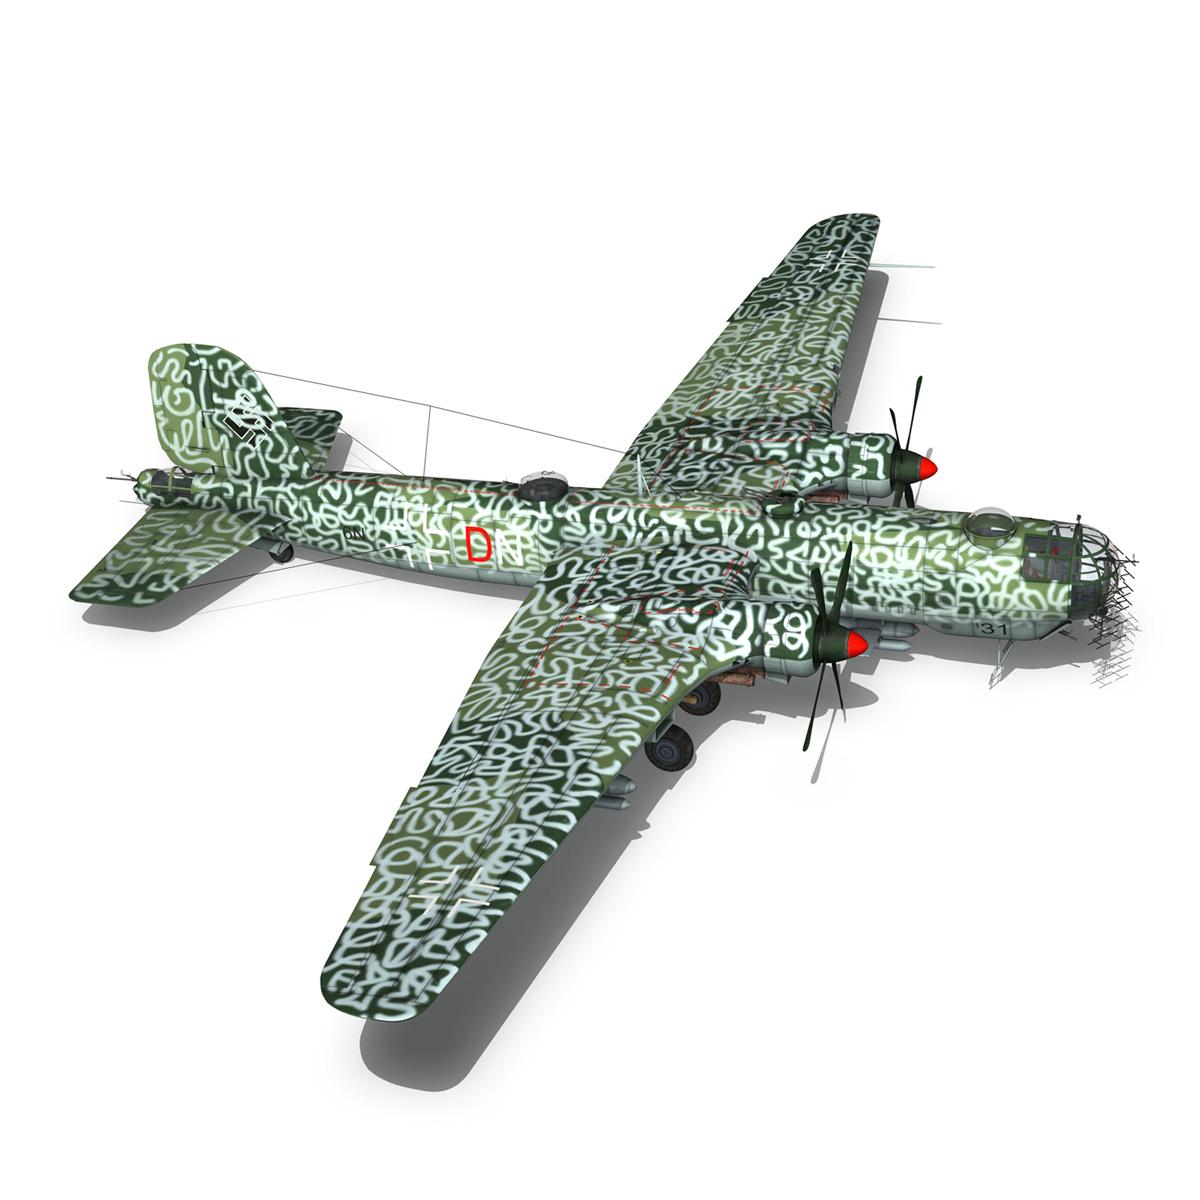 heinkel he-177 a-5 – greif – 6ndn 3d model 3ds fbx c4d lwo obj 201594